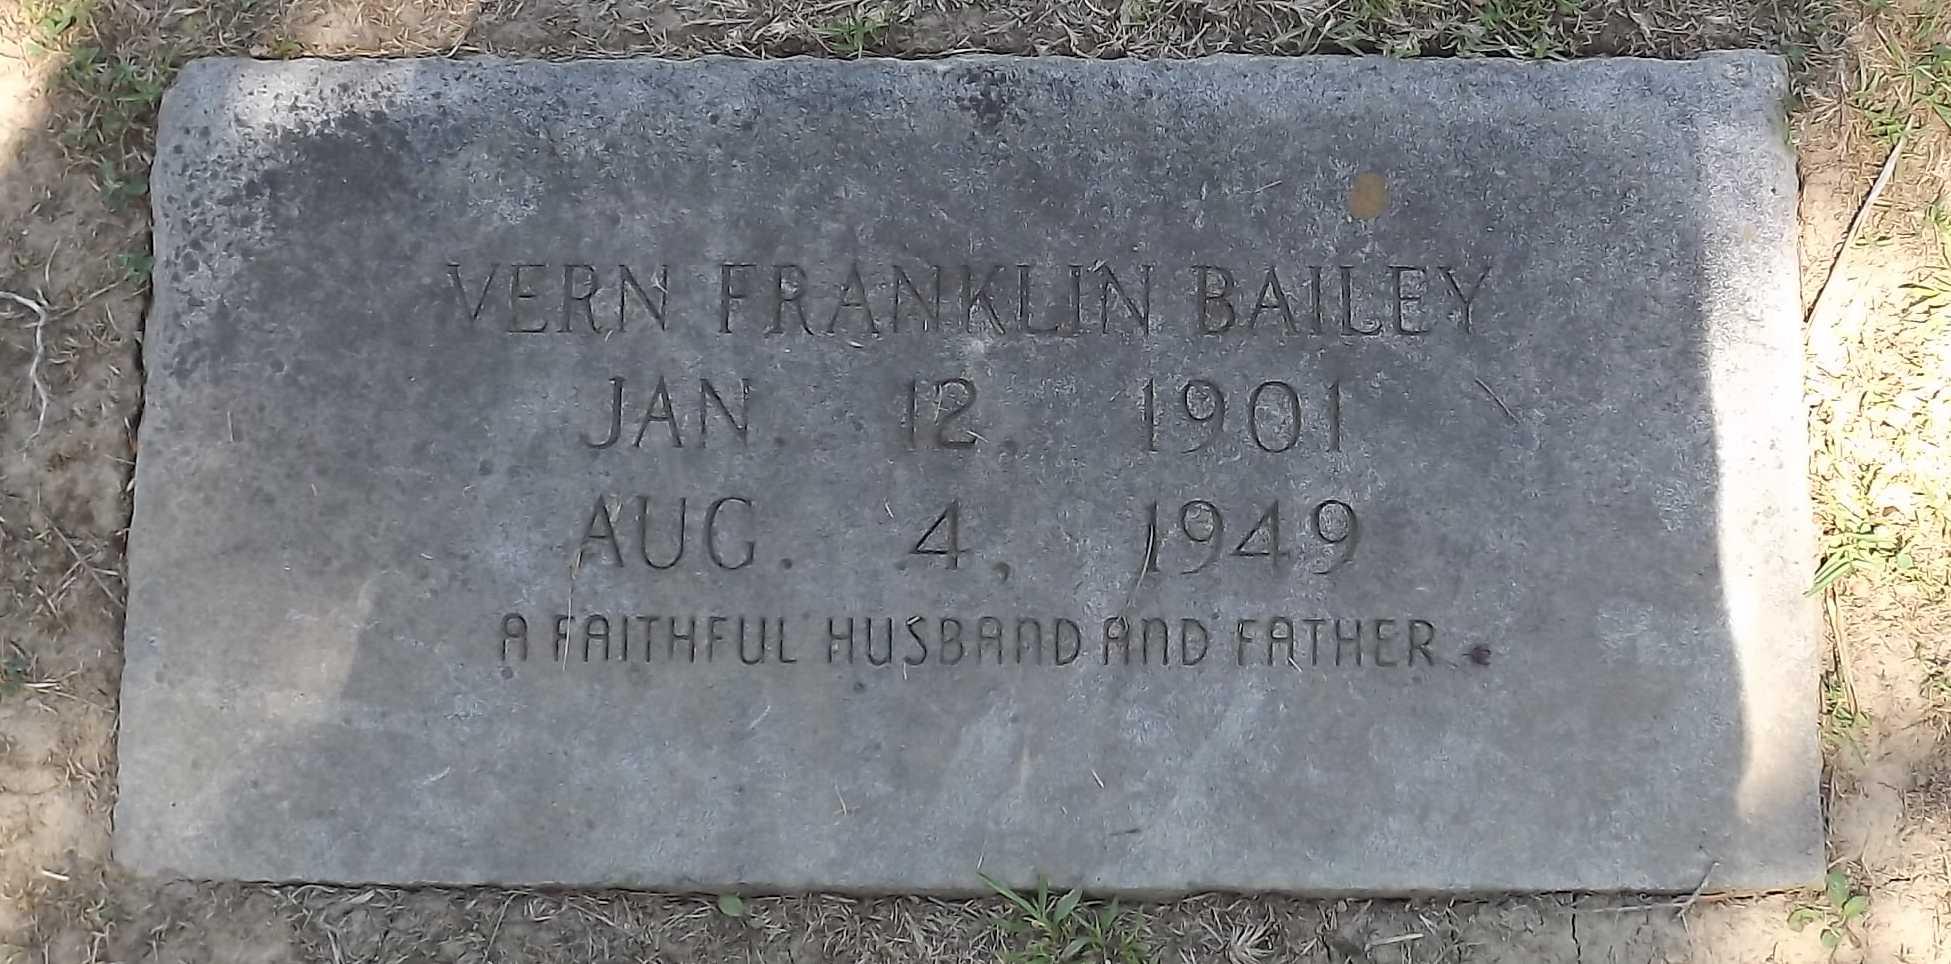 Vern F. Bailey